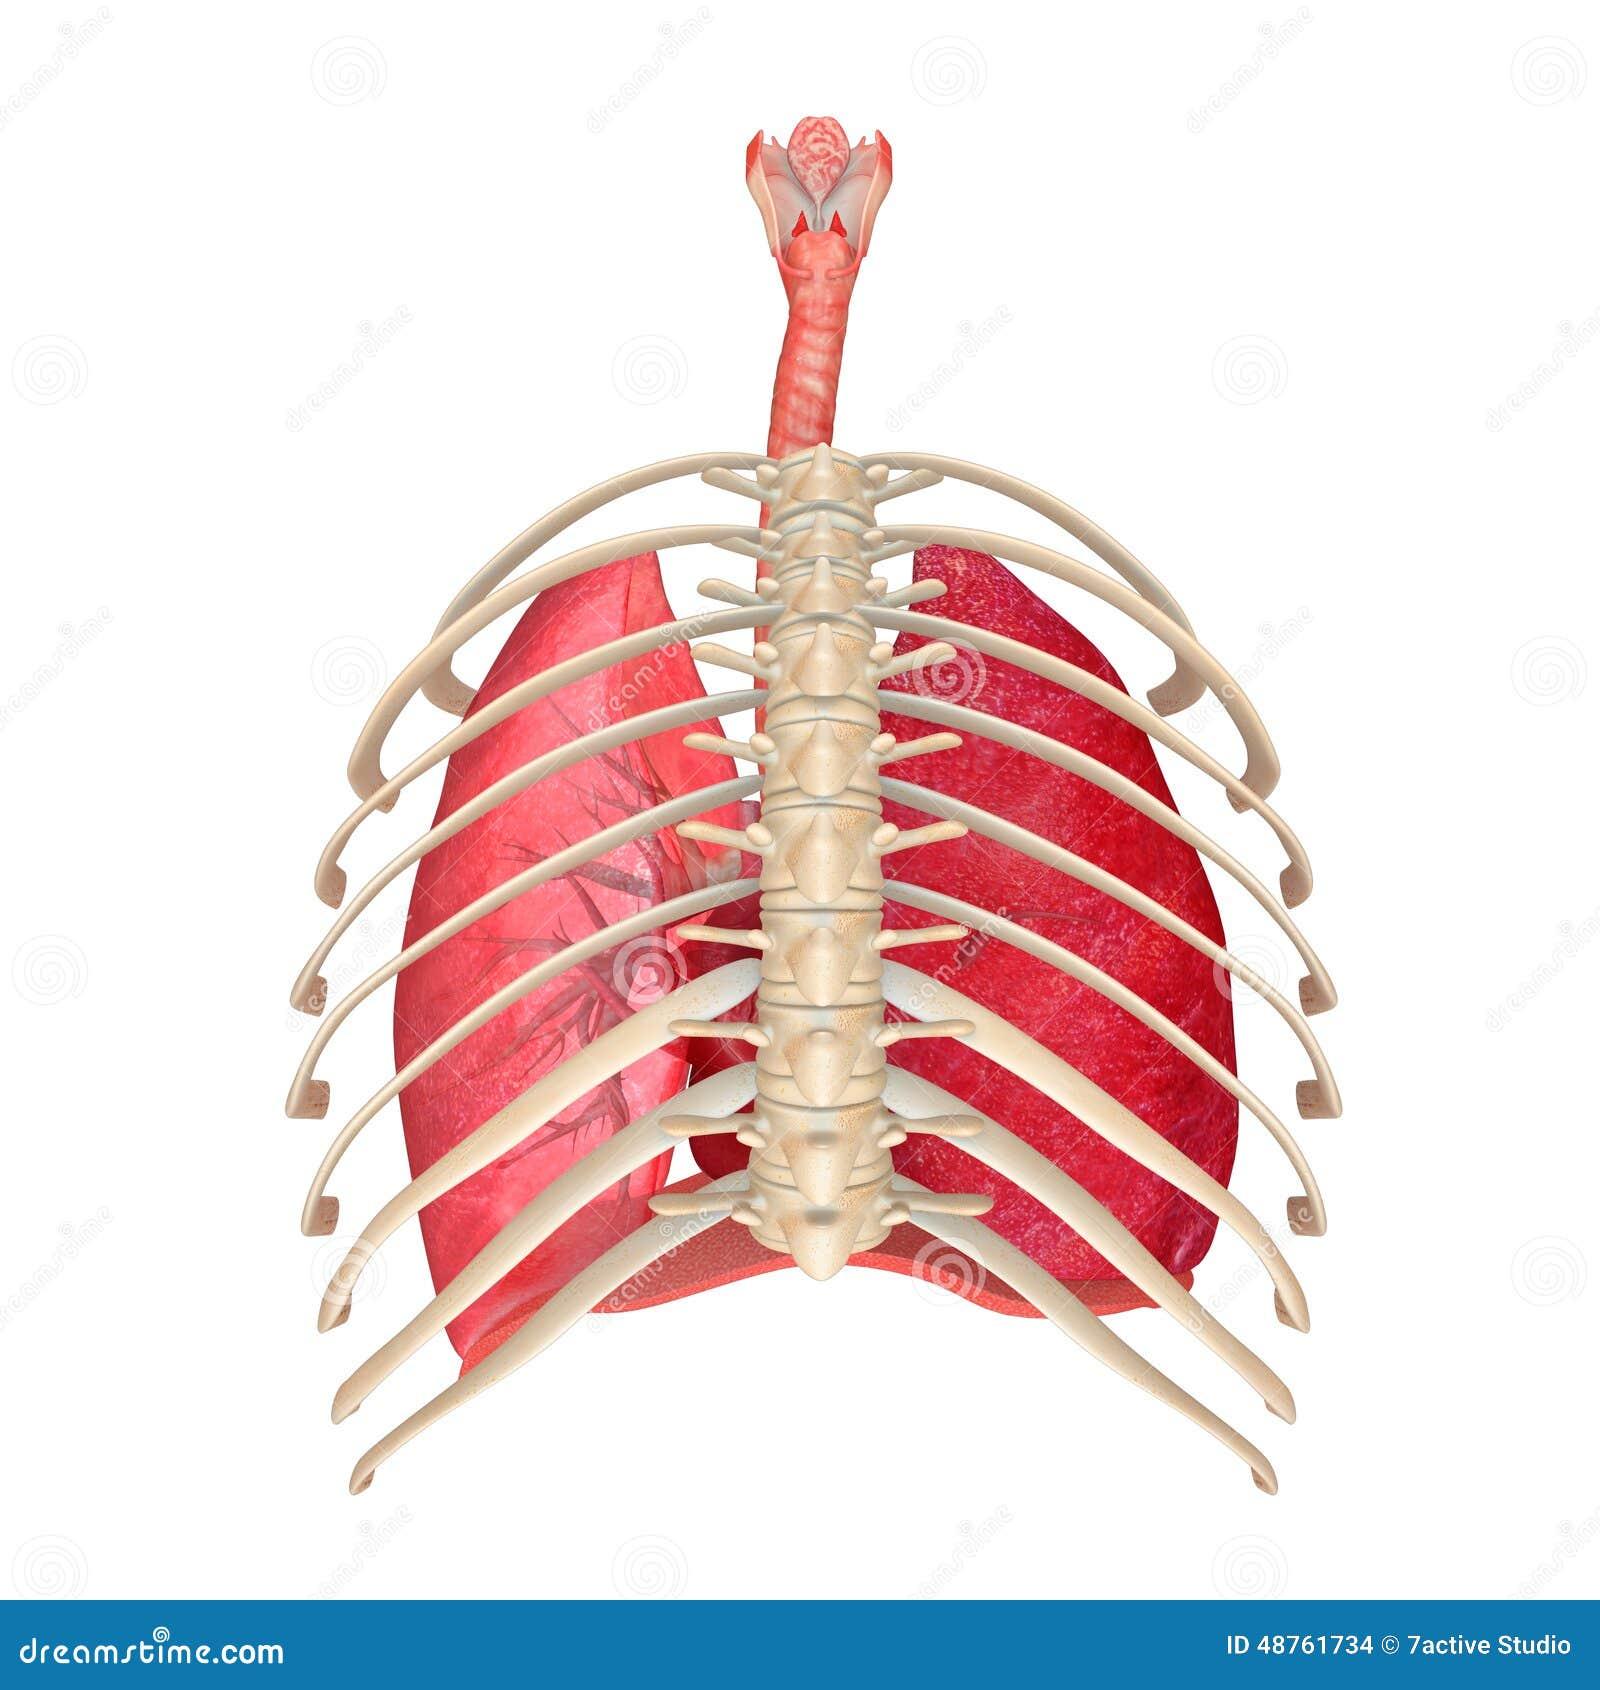 human respiratory system pdf free download